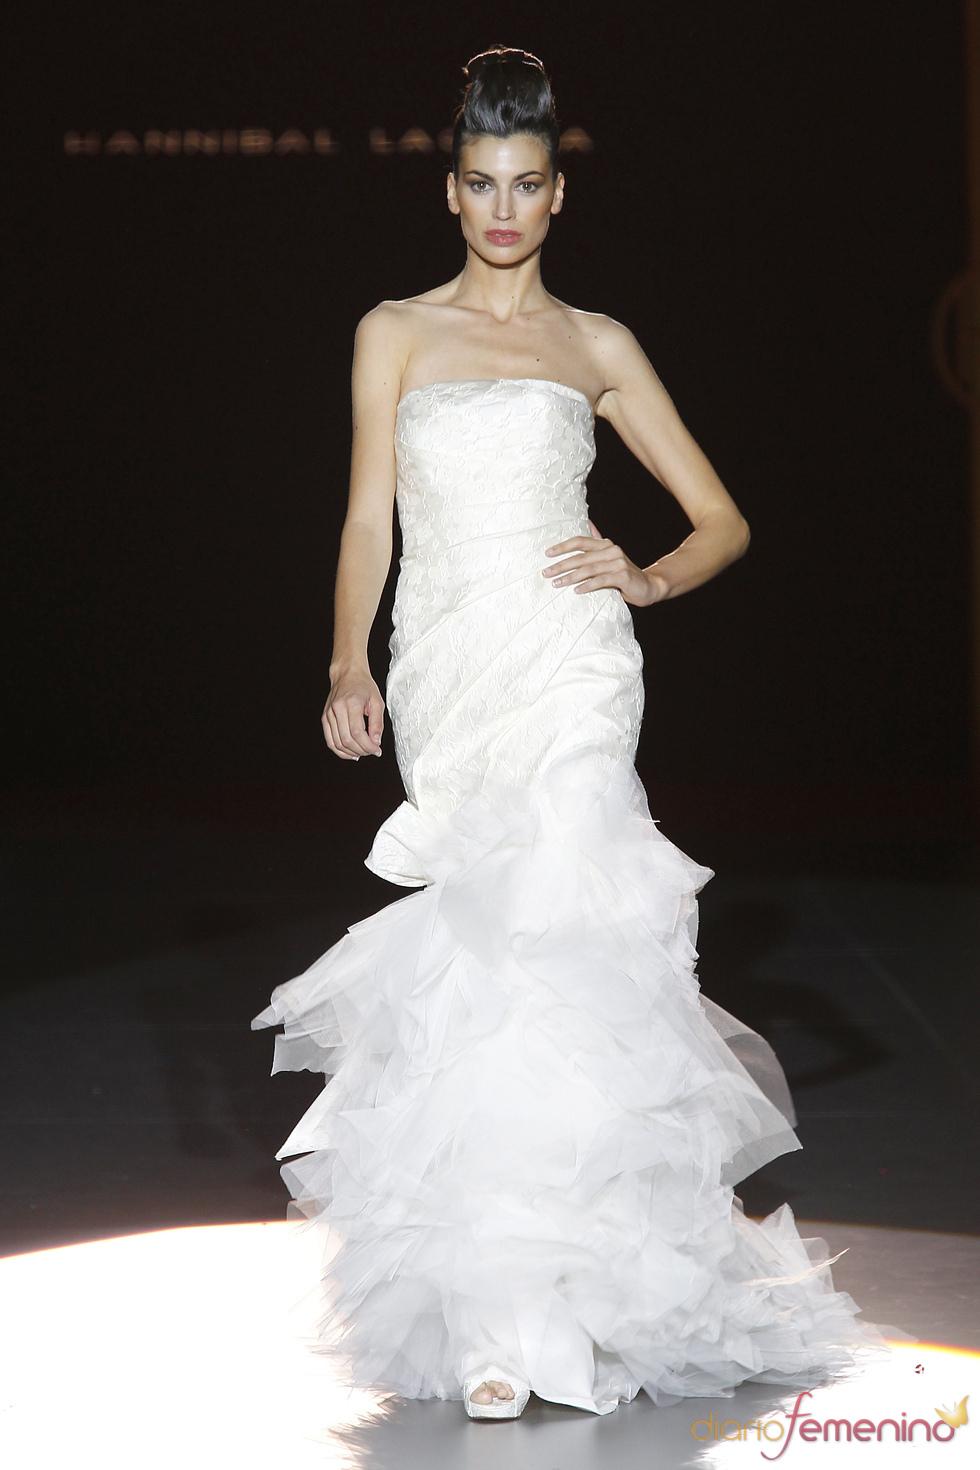 Colección de novia de Hannibal Laguna en Cibeles Novias 2010